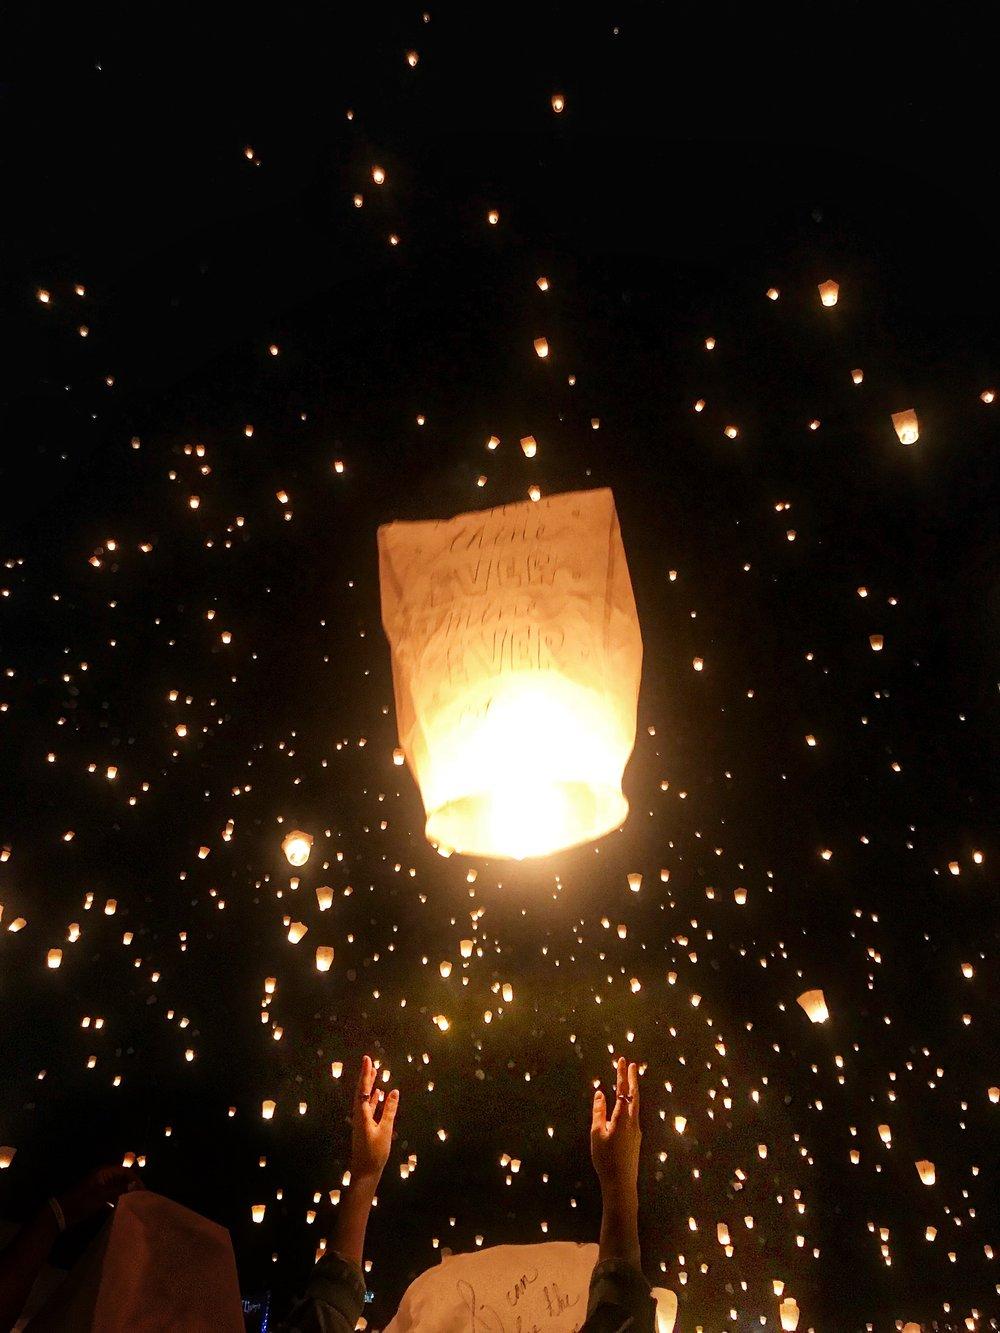 lorna-ryan.com The Lights Fest